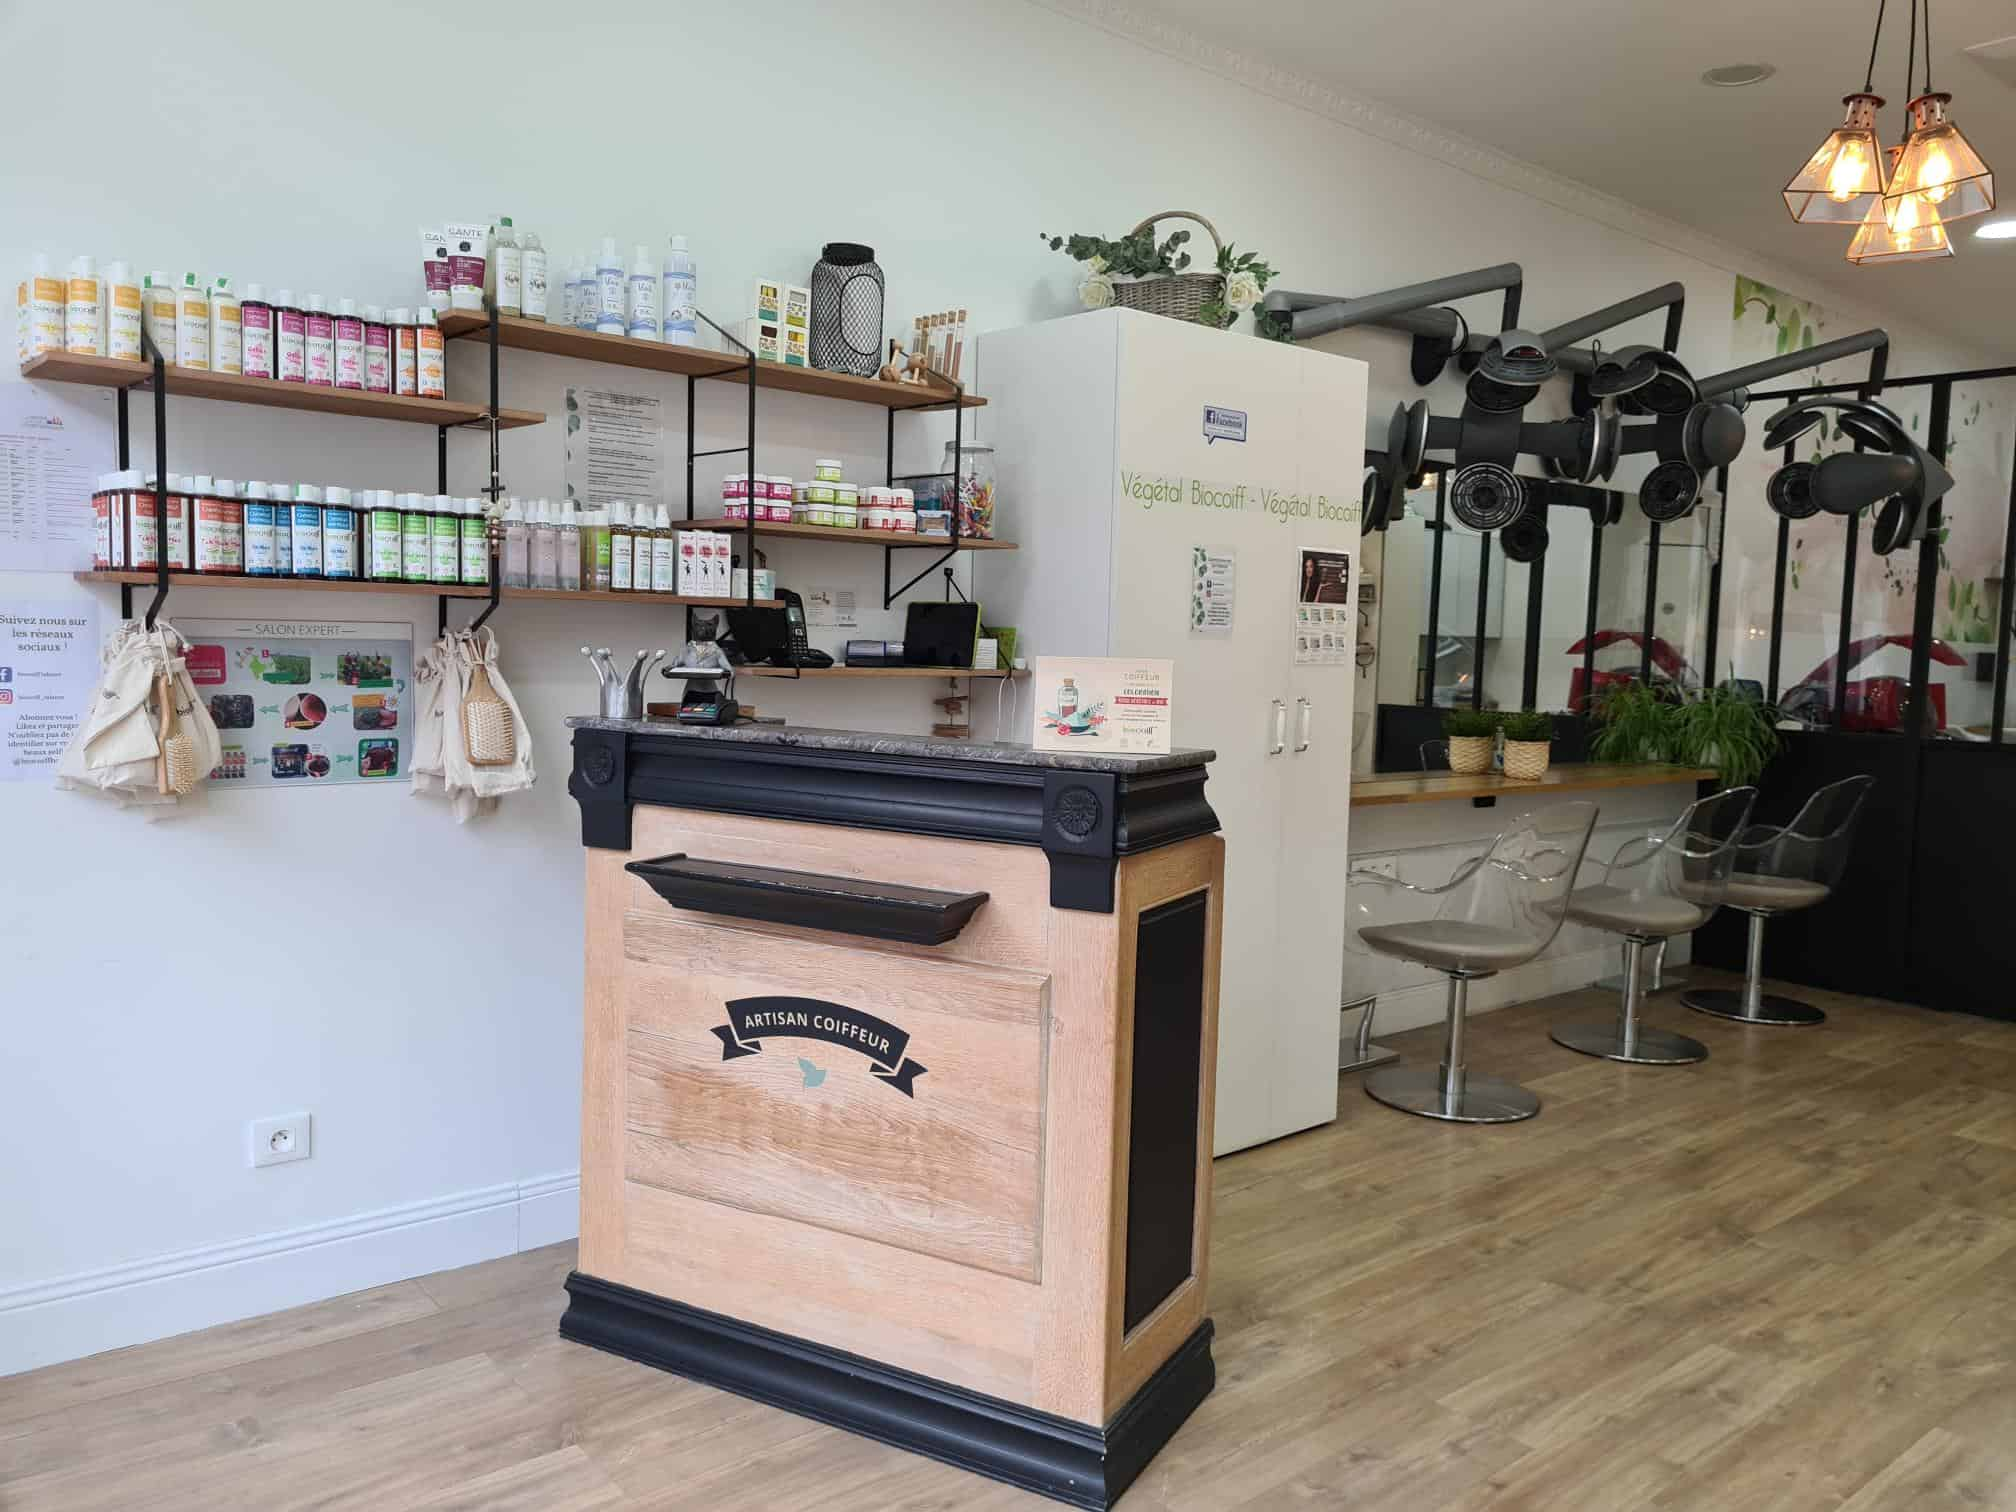 accueil Biocoiff Talence coiffeur végétal